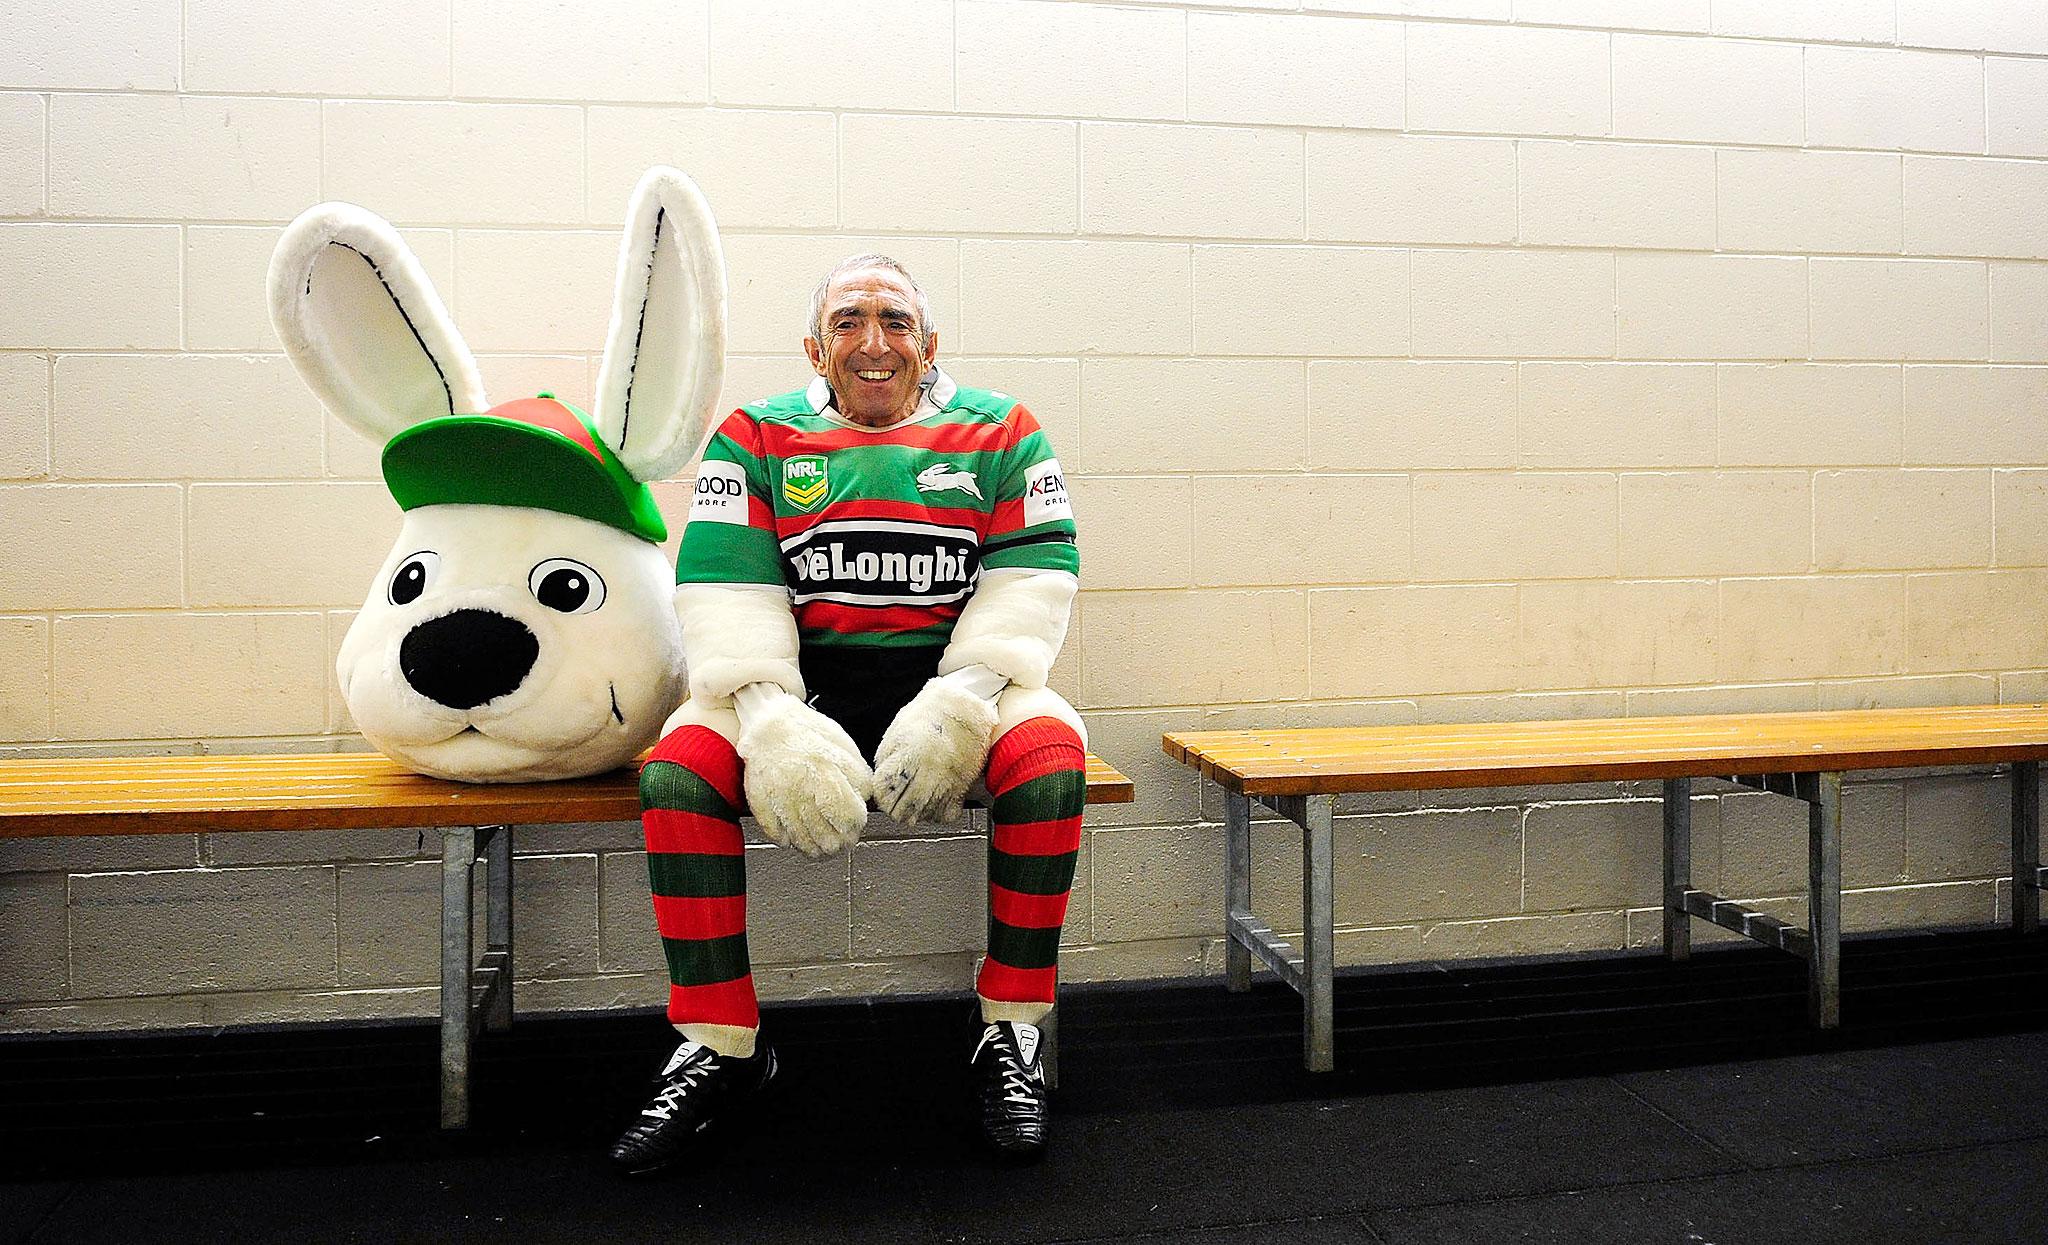 Rabbitohs Mascot